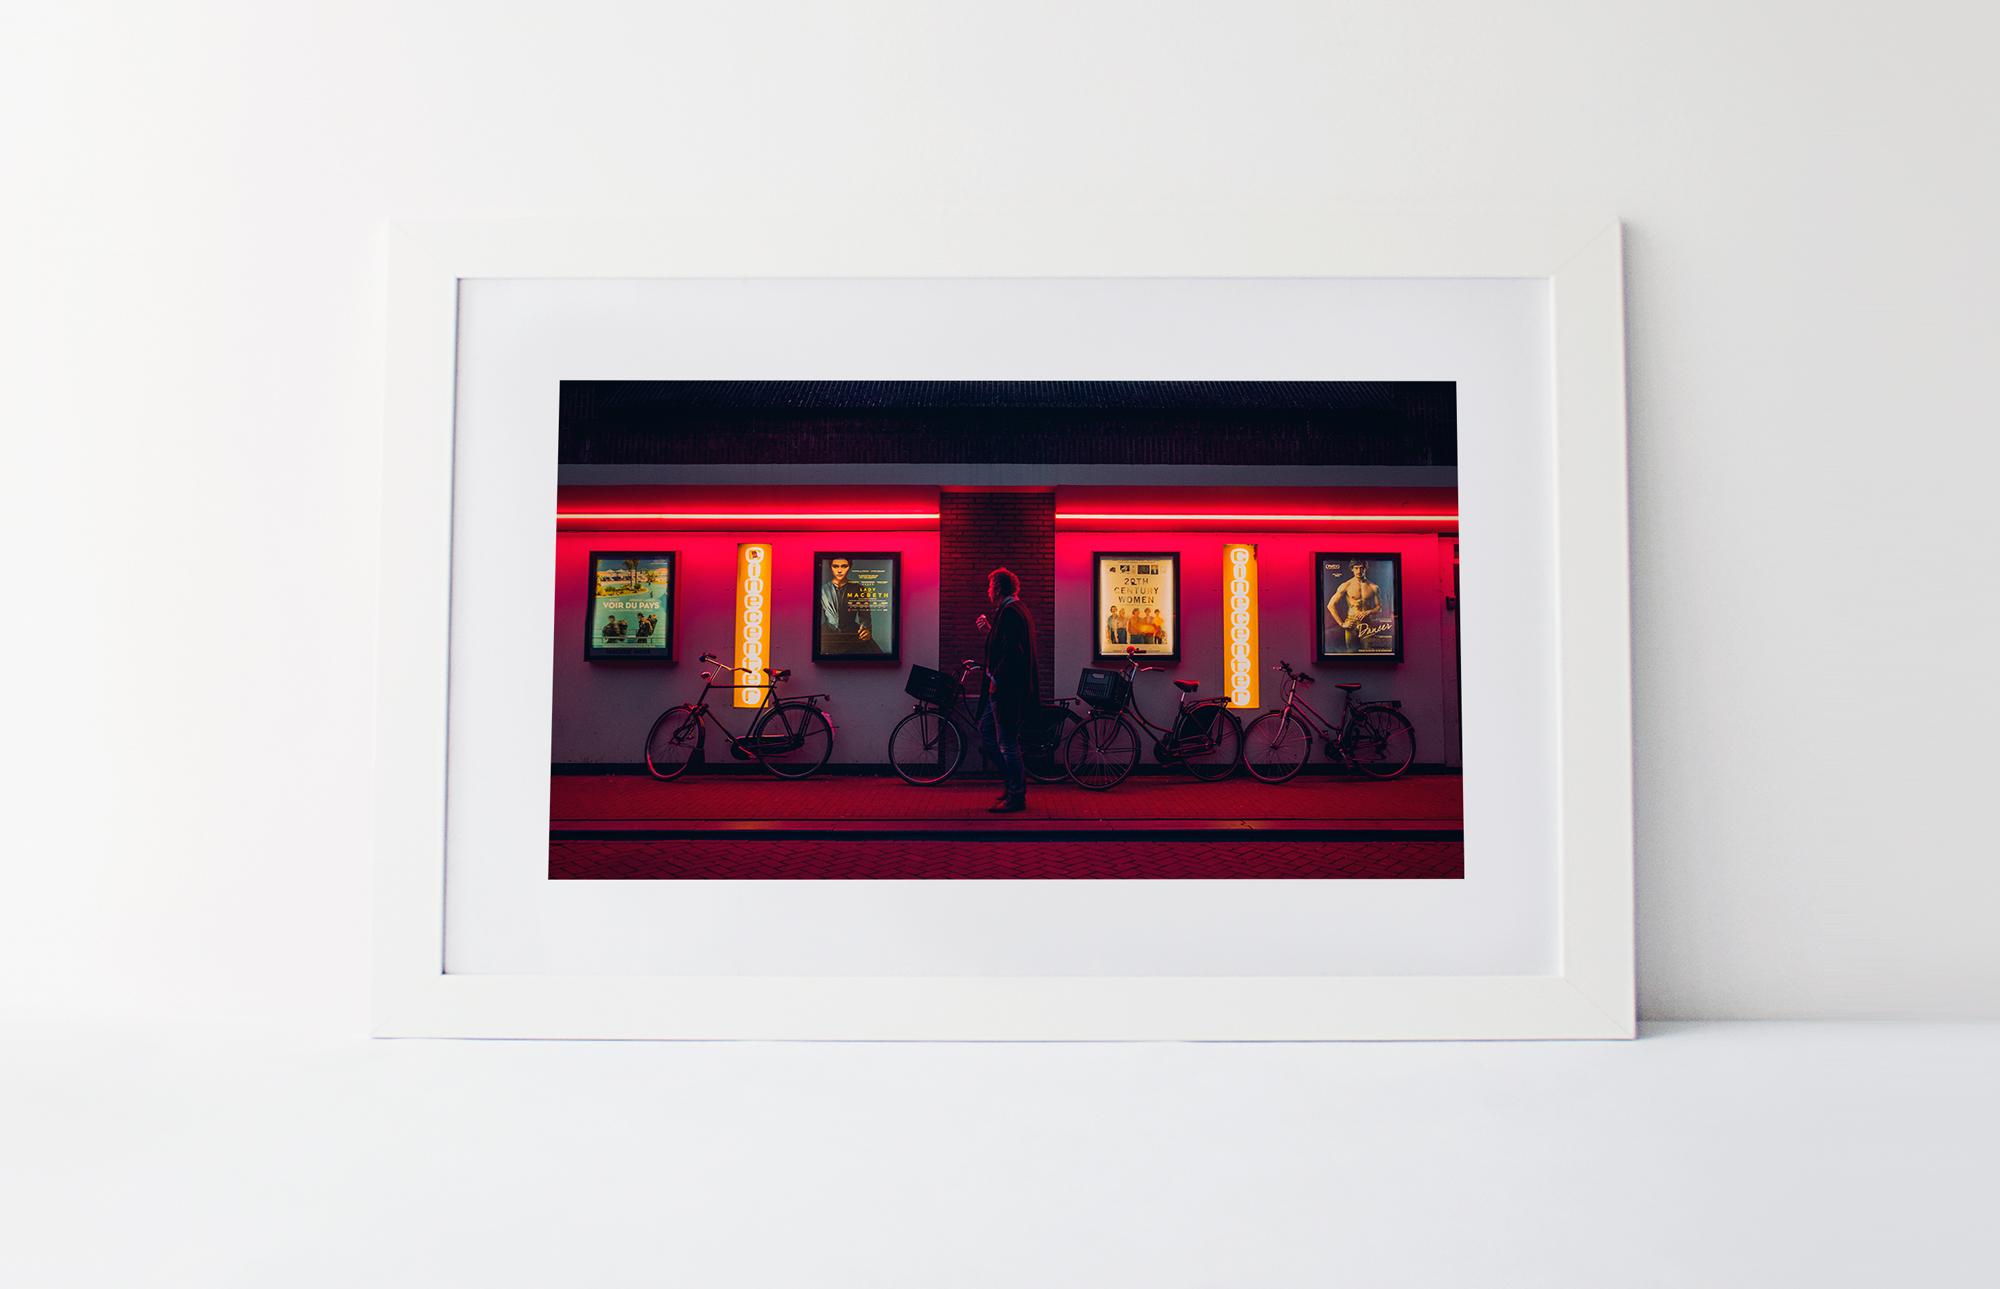 Red light cinema  40cm x 60cm print Frame included